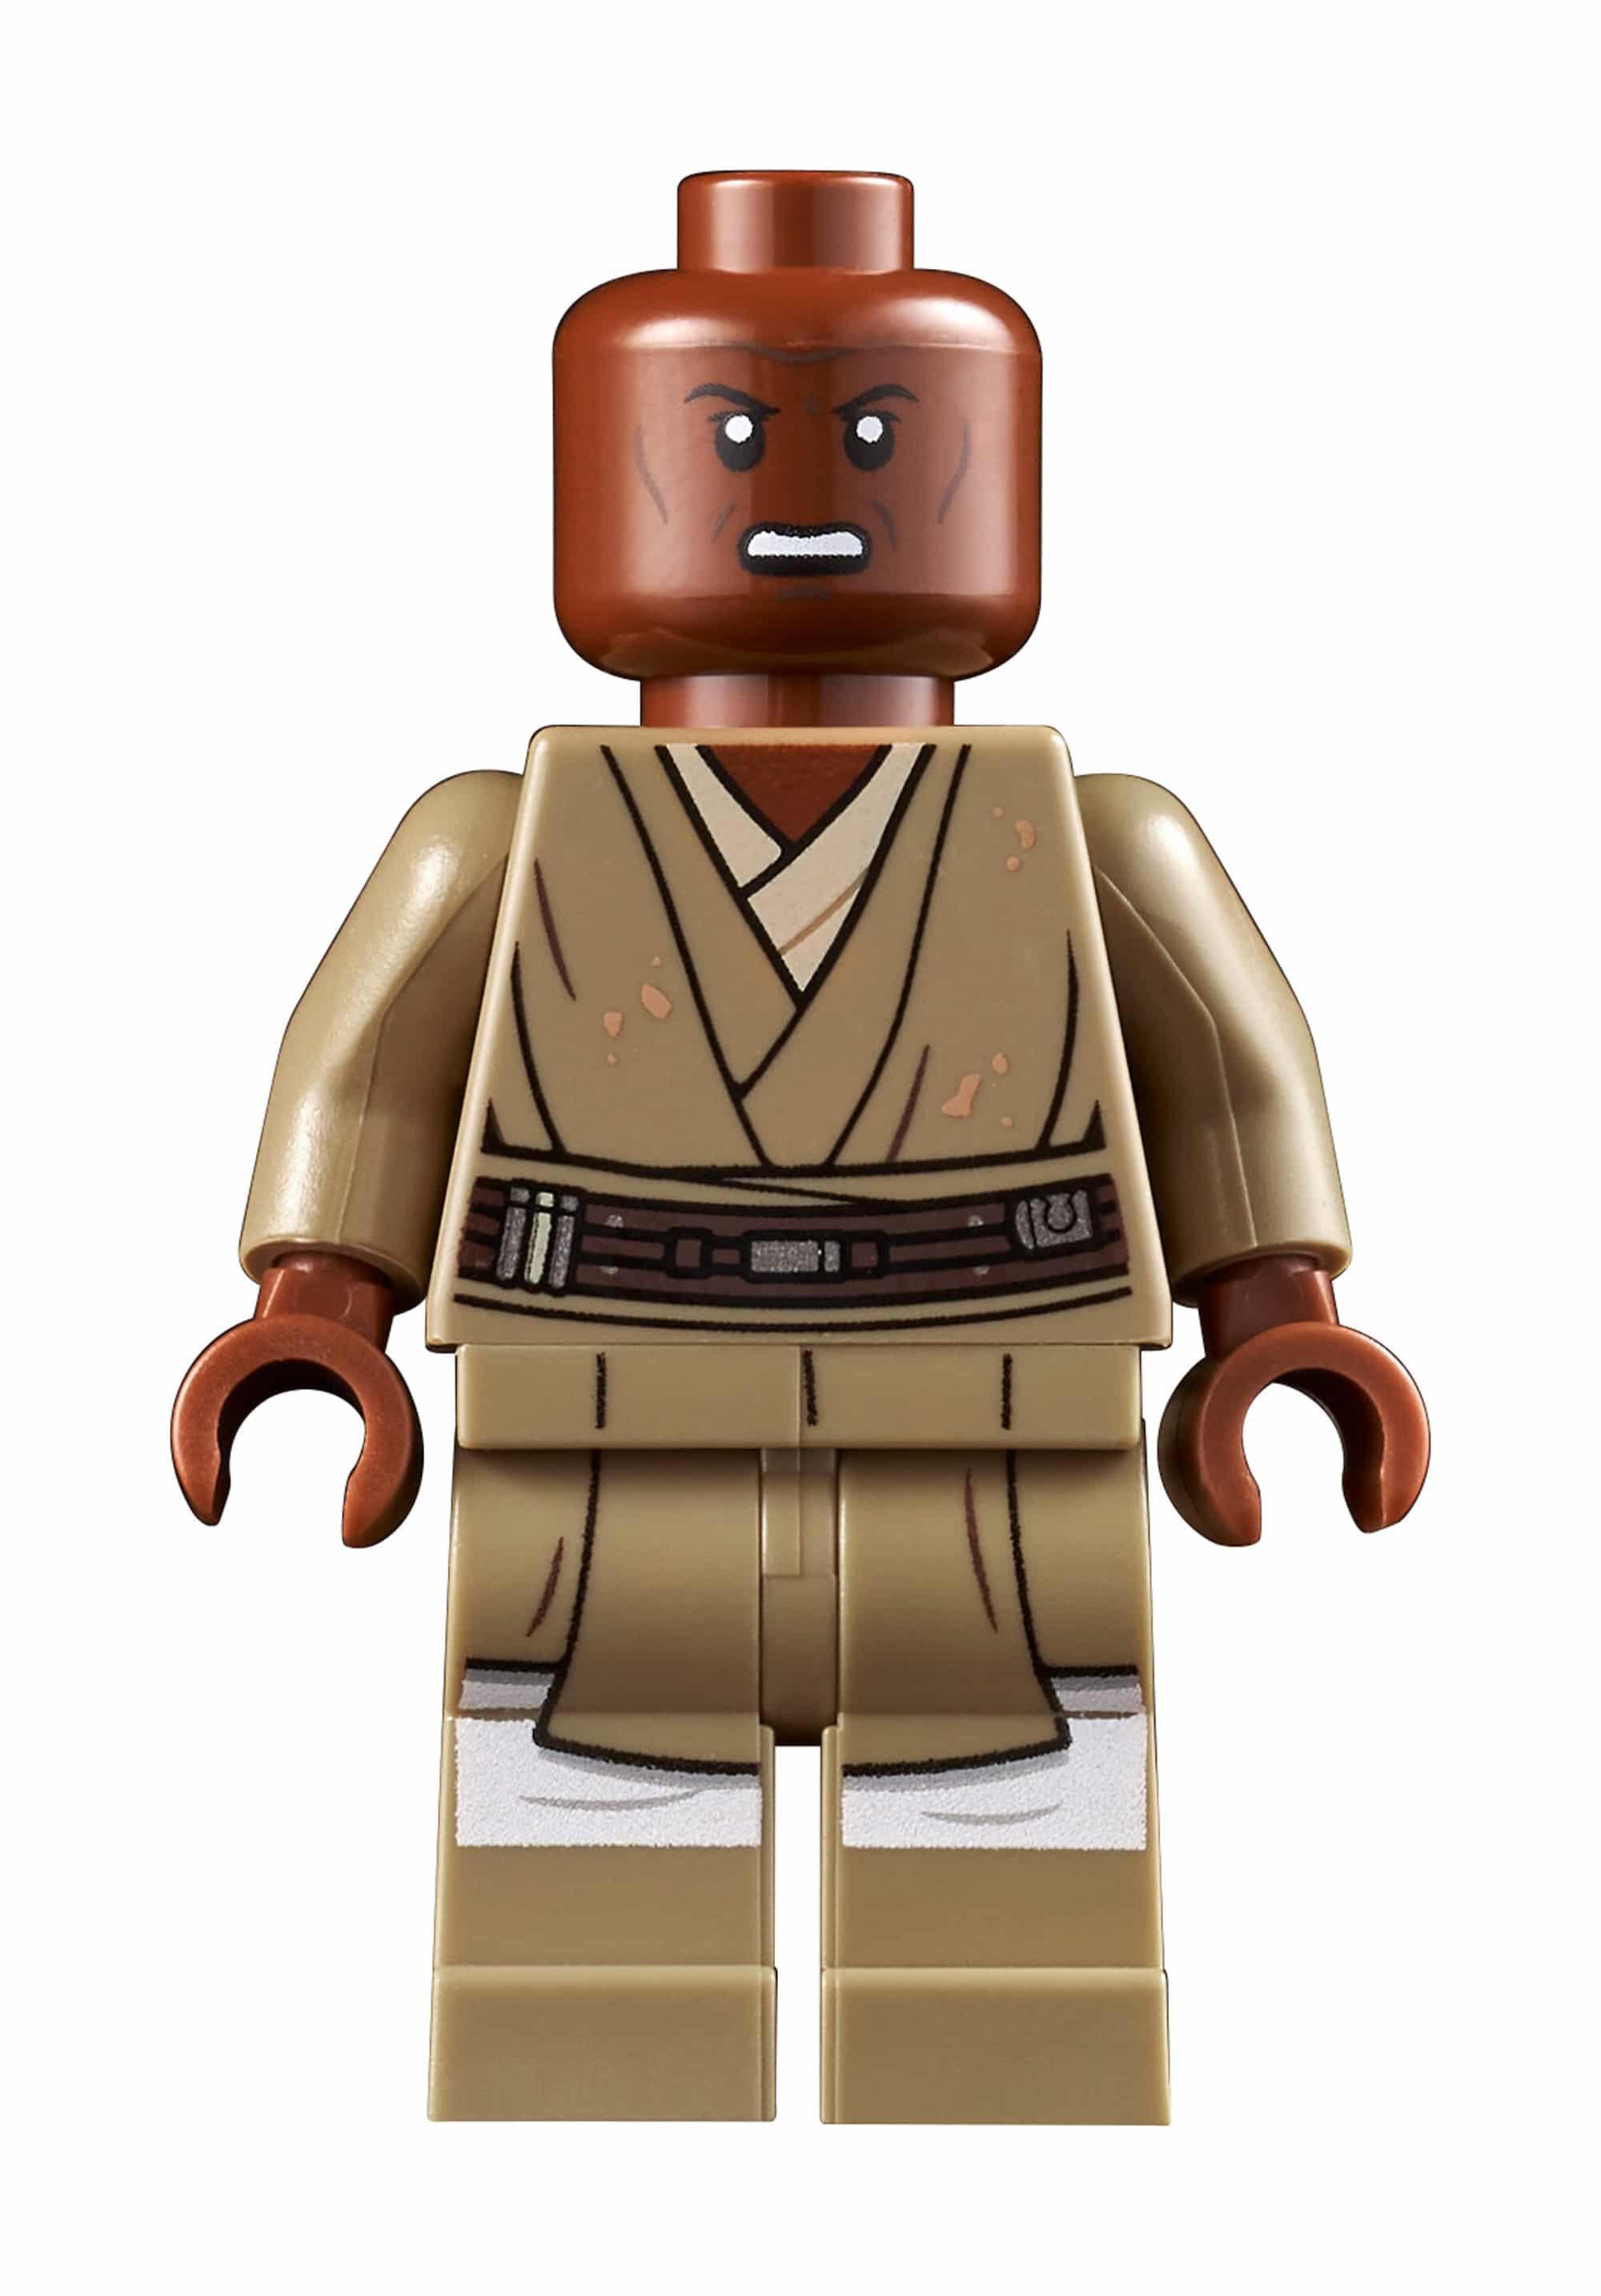 LEGO Star Wars 75309 Ucs Republic Gunship Mace Windu